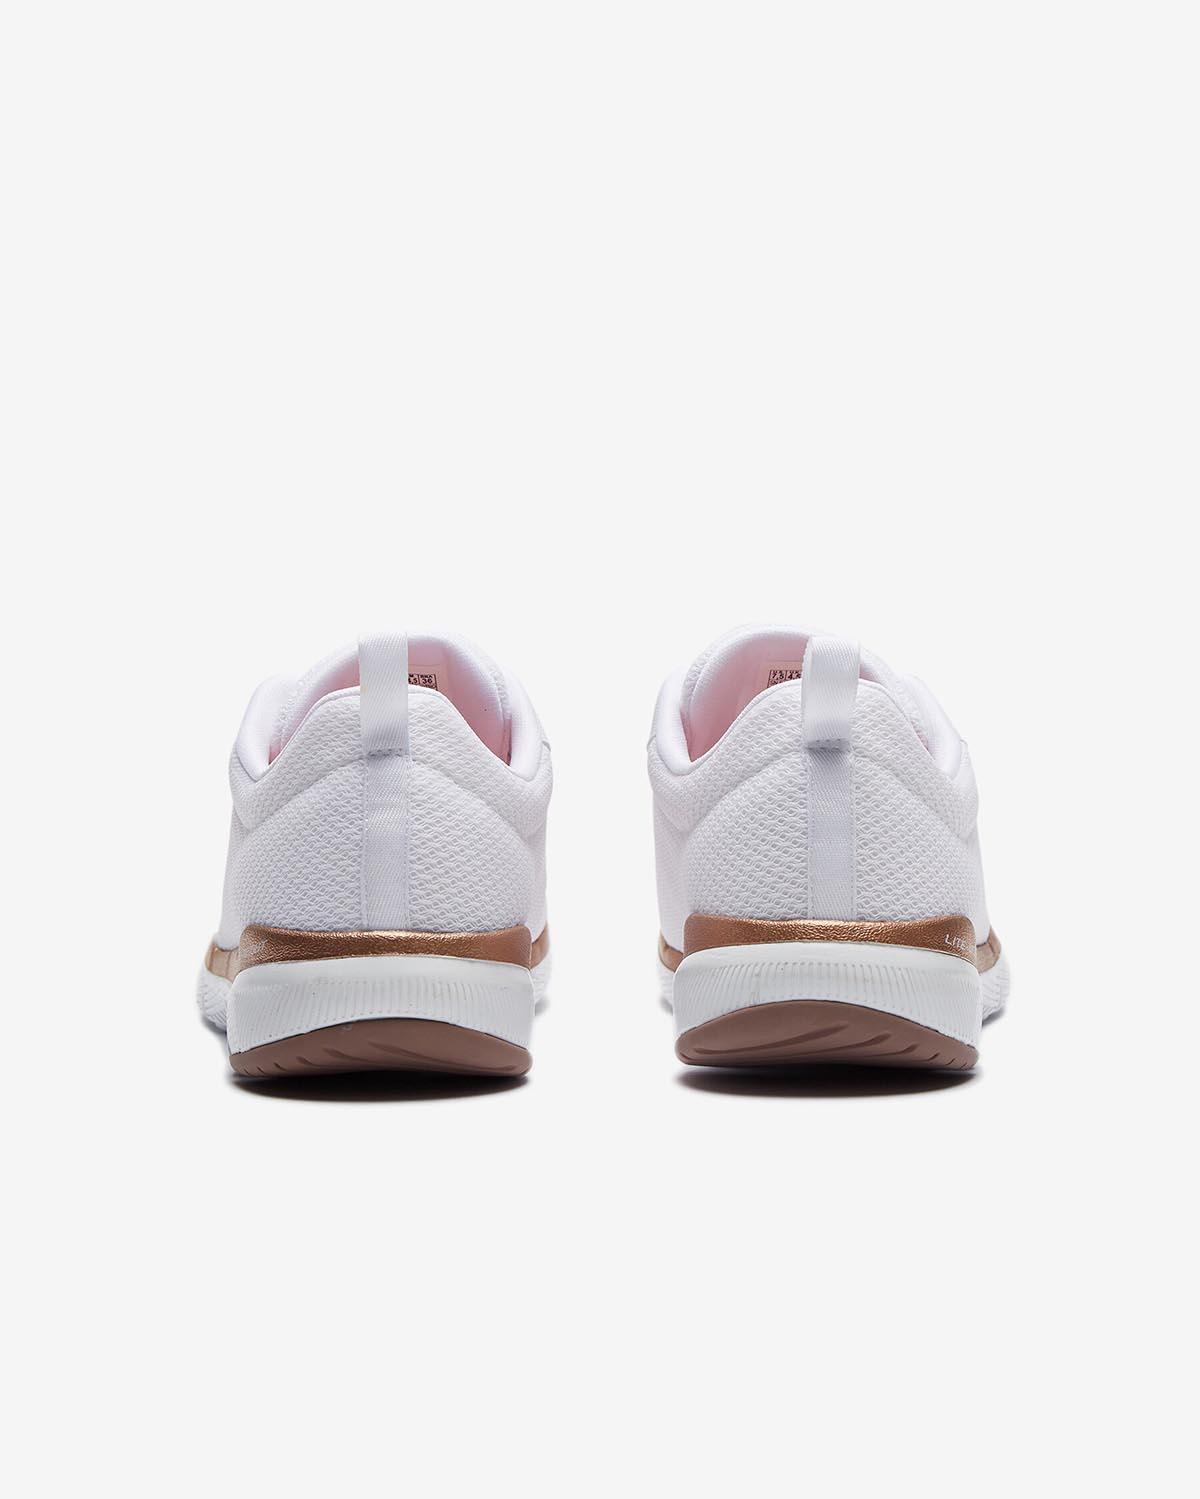 Skechers FLEX APPEAL 3.0 Bayan Ayakkabısı SKCS13070 WTRG